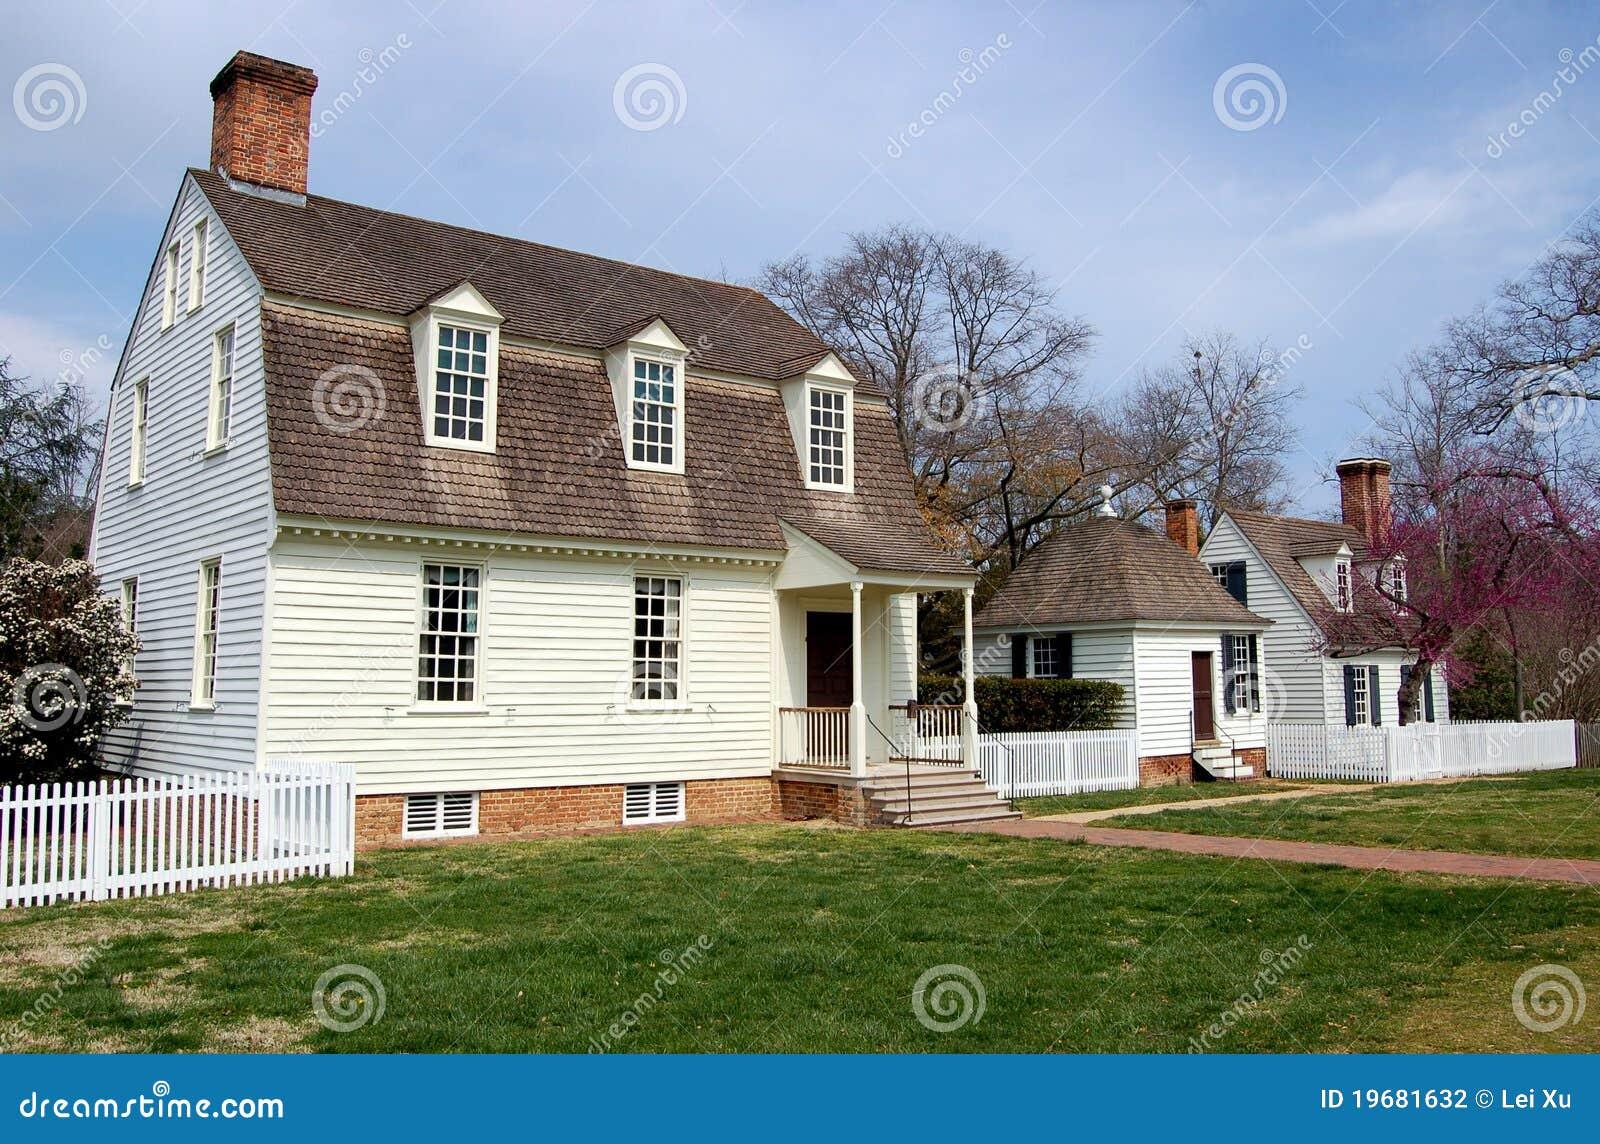 shingle style gambrel roof house stock photo image 58988370 williamsburg va 1730 co john taylor house stock photography